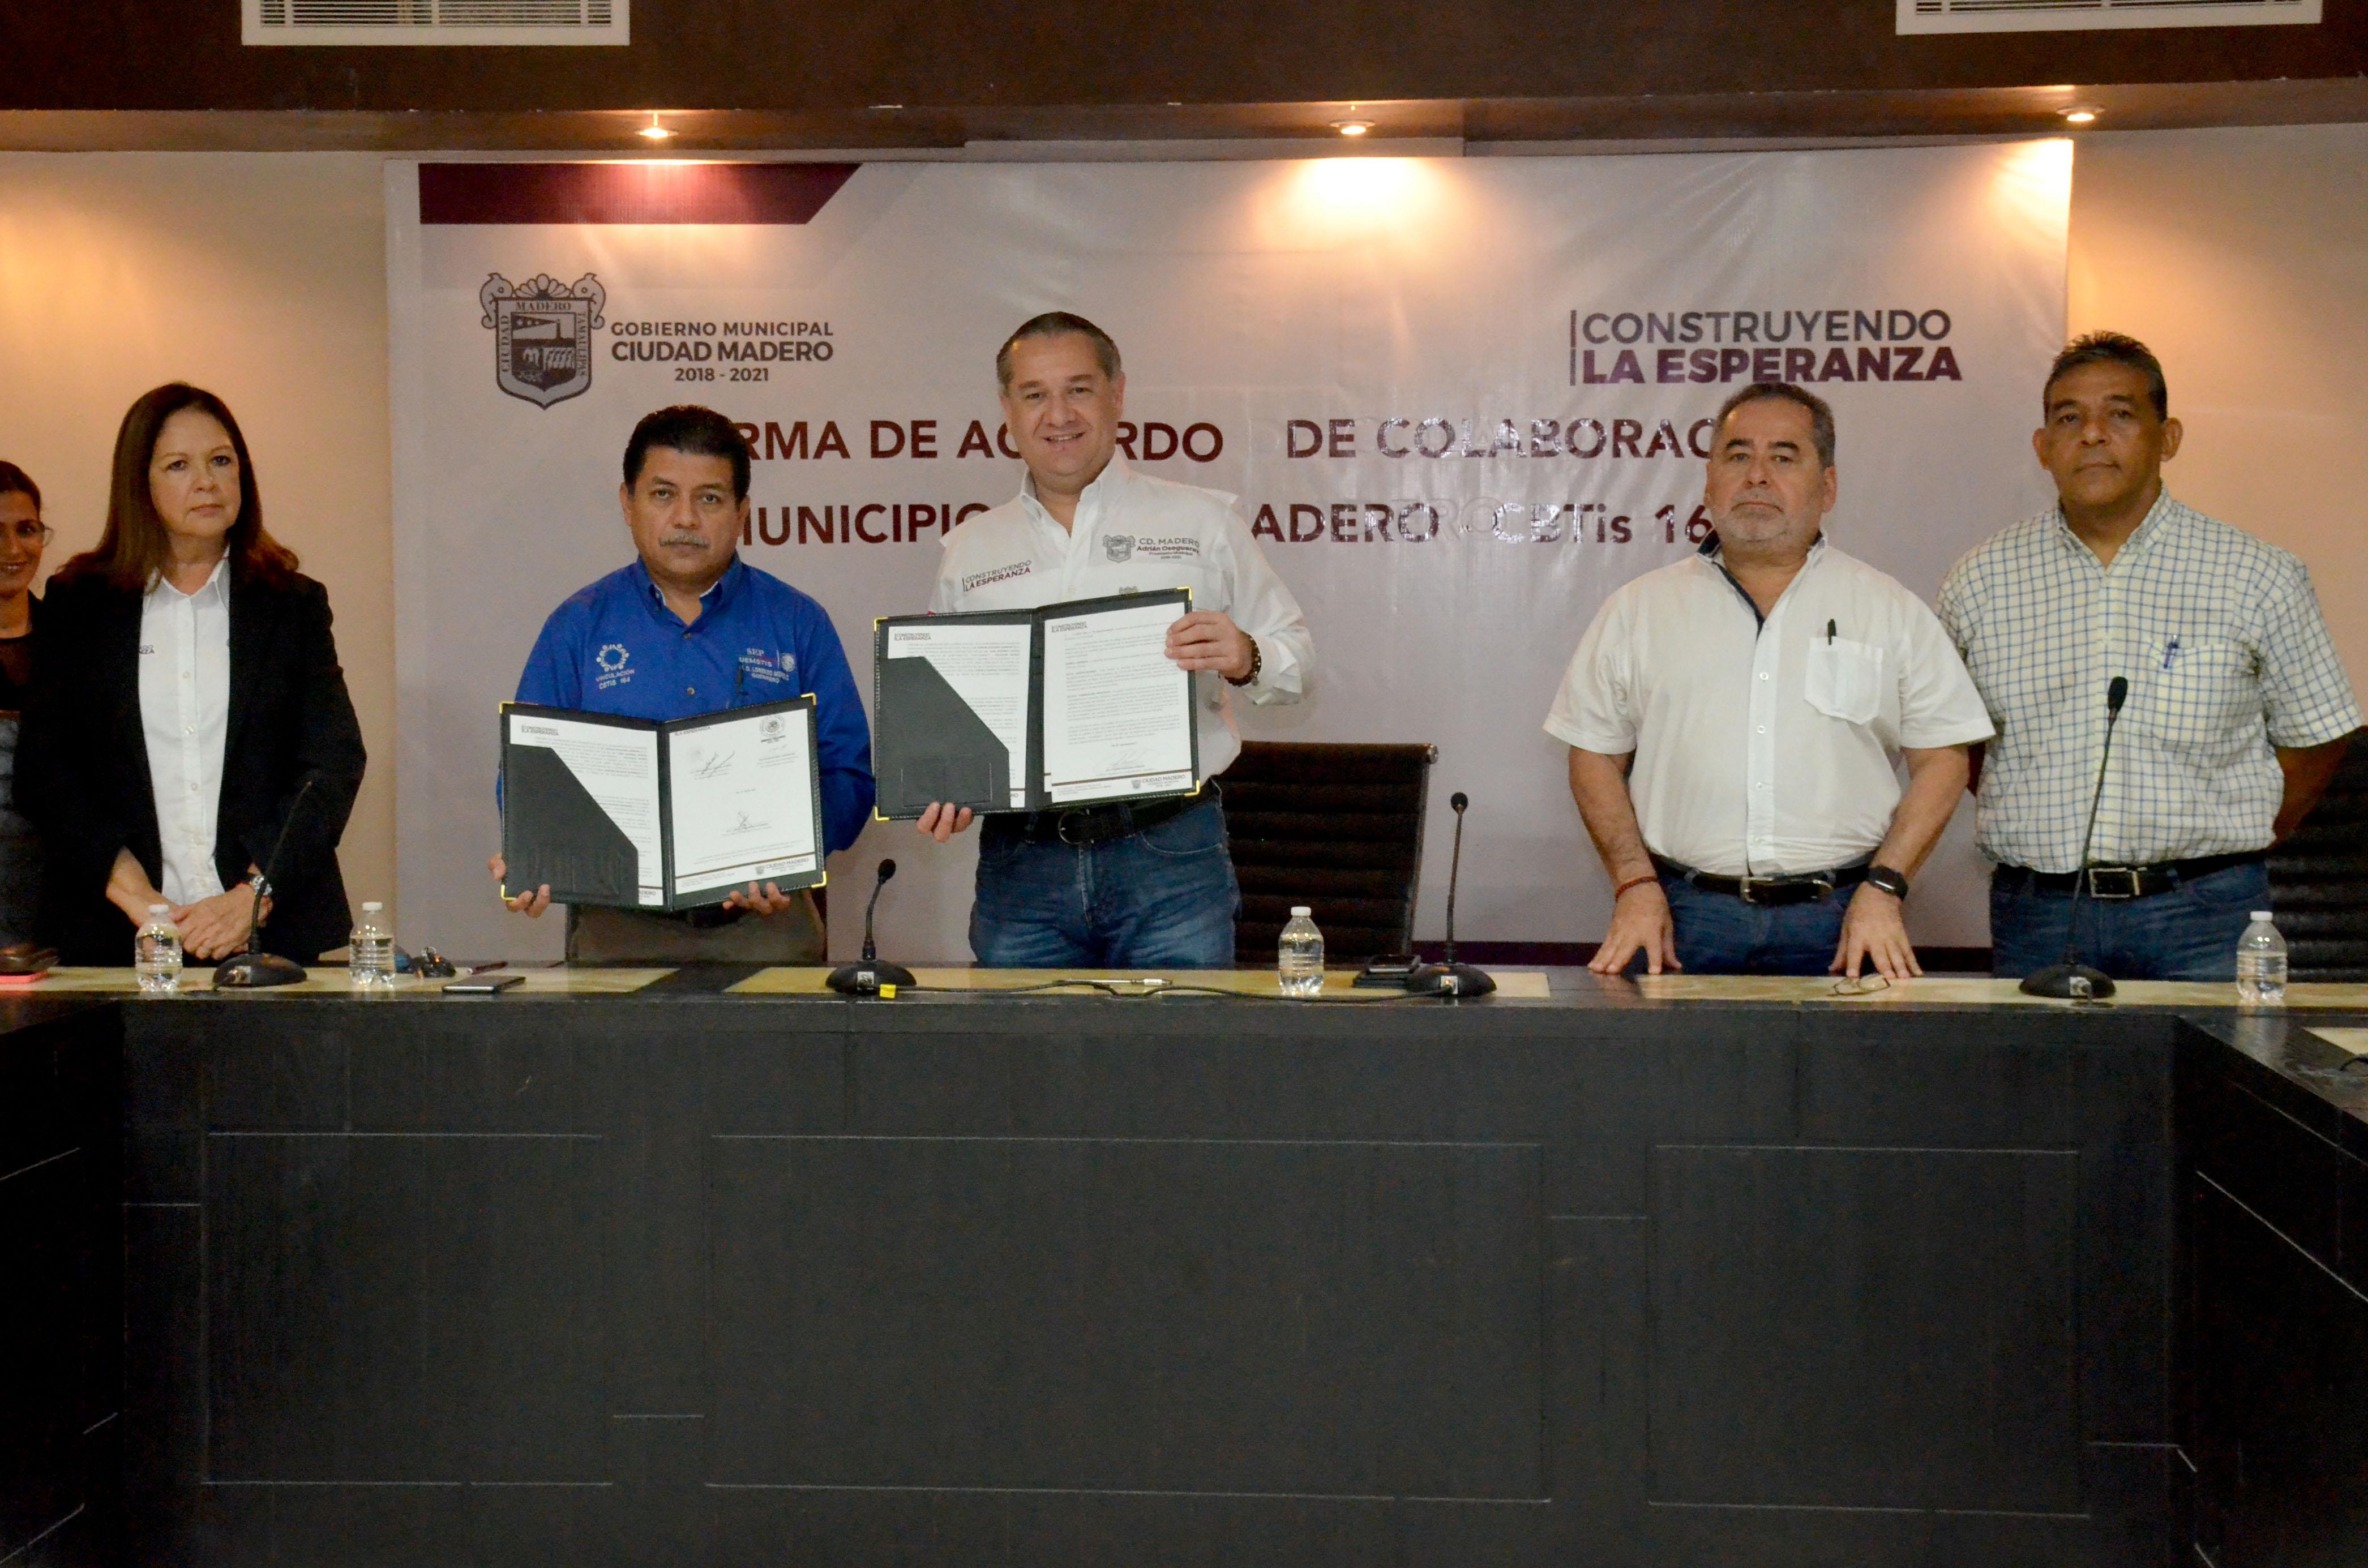 Impulsa Adrián Oseguera estudiantes del CBTis 164